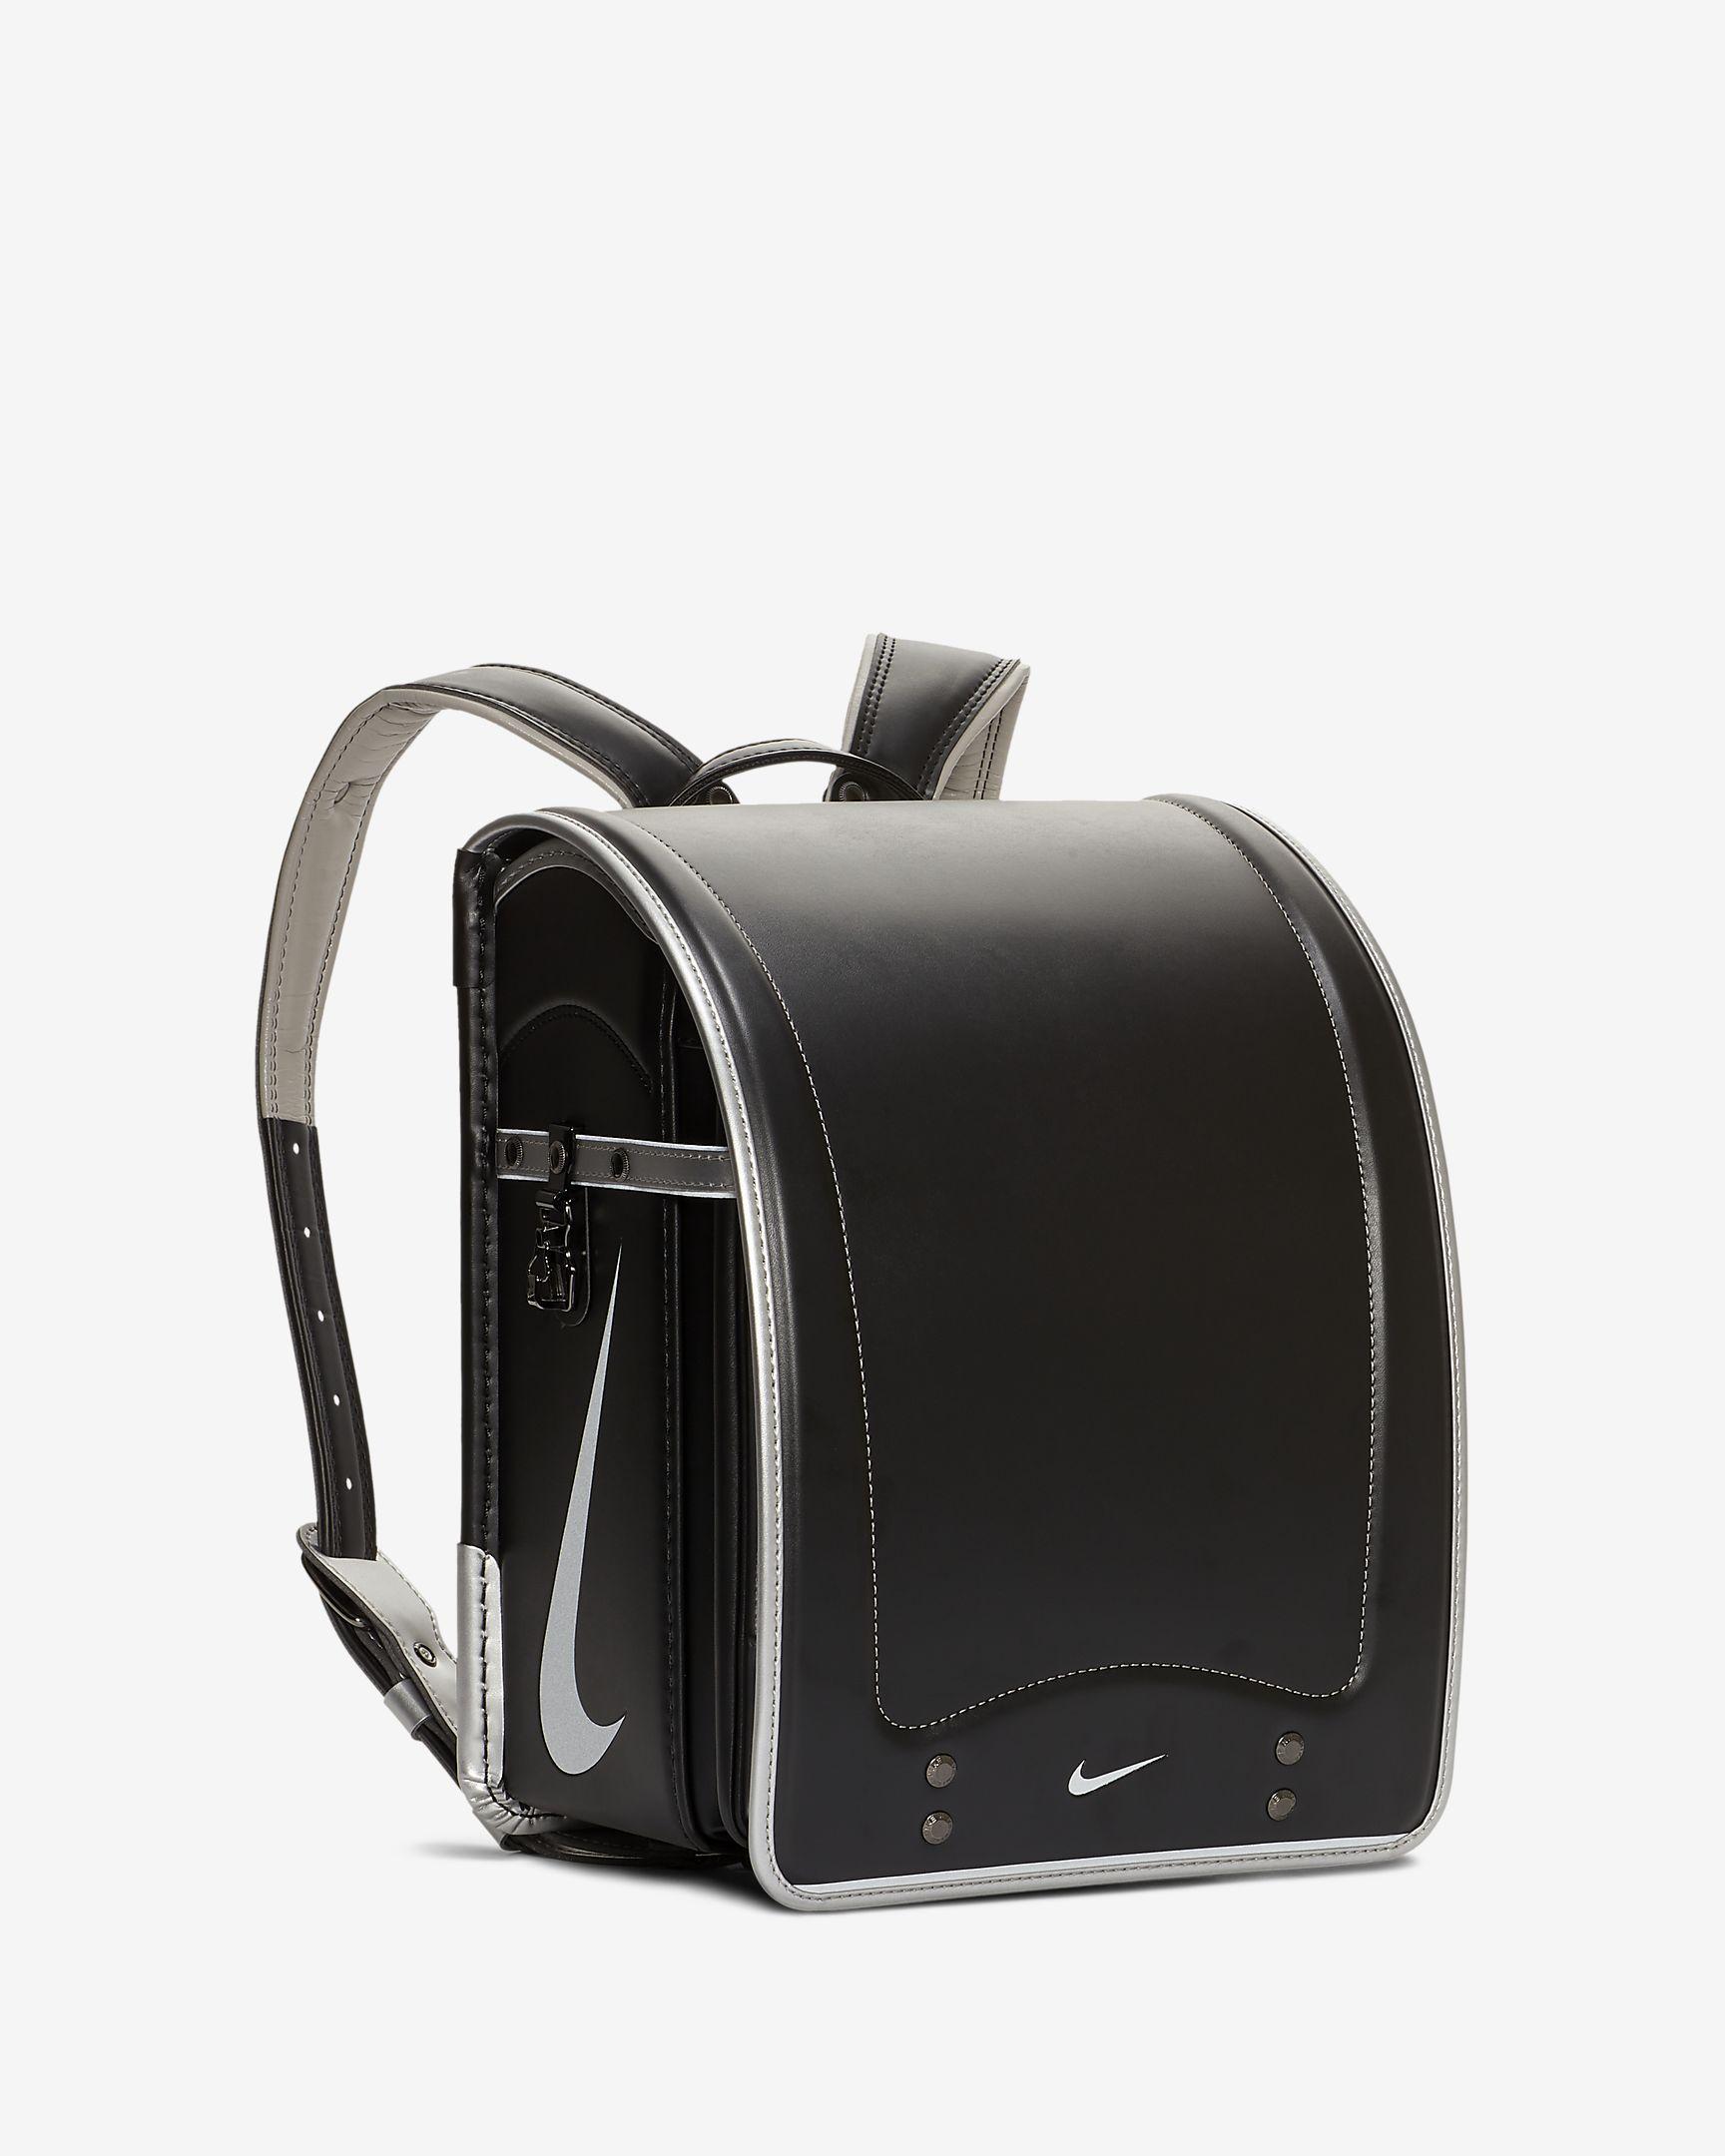 32e4ff4610ad Nike NikeLab Gyakusou Bandit Sunglasses (Blue) | Products